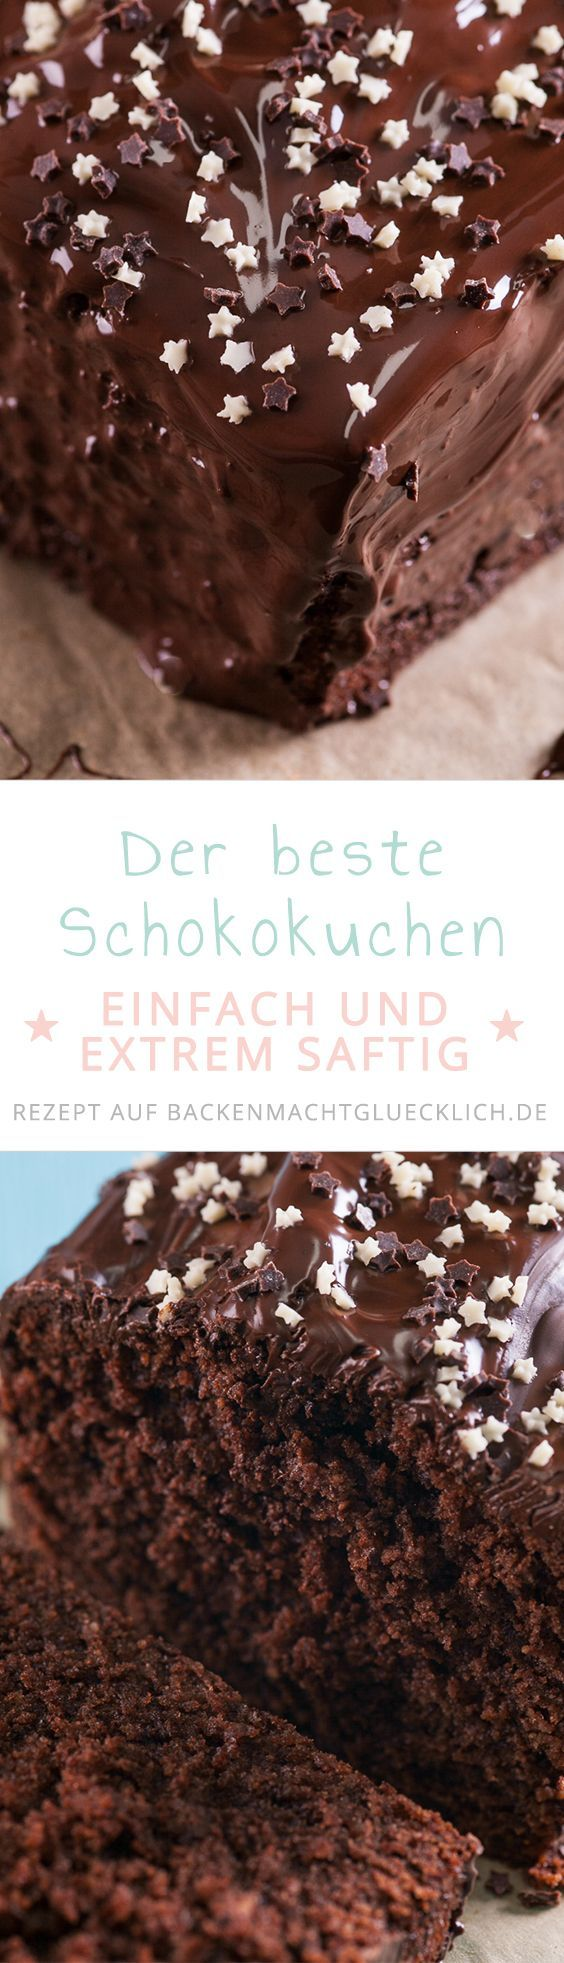 Photo of Pastel de chocolate jugoso simple Hornear te hace feliz